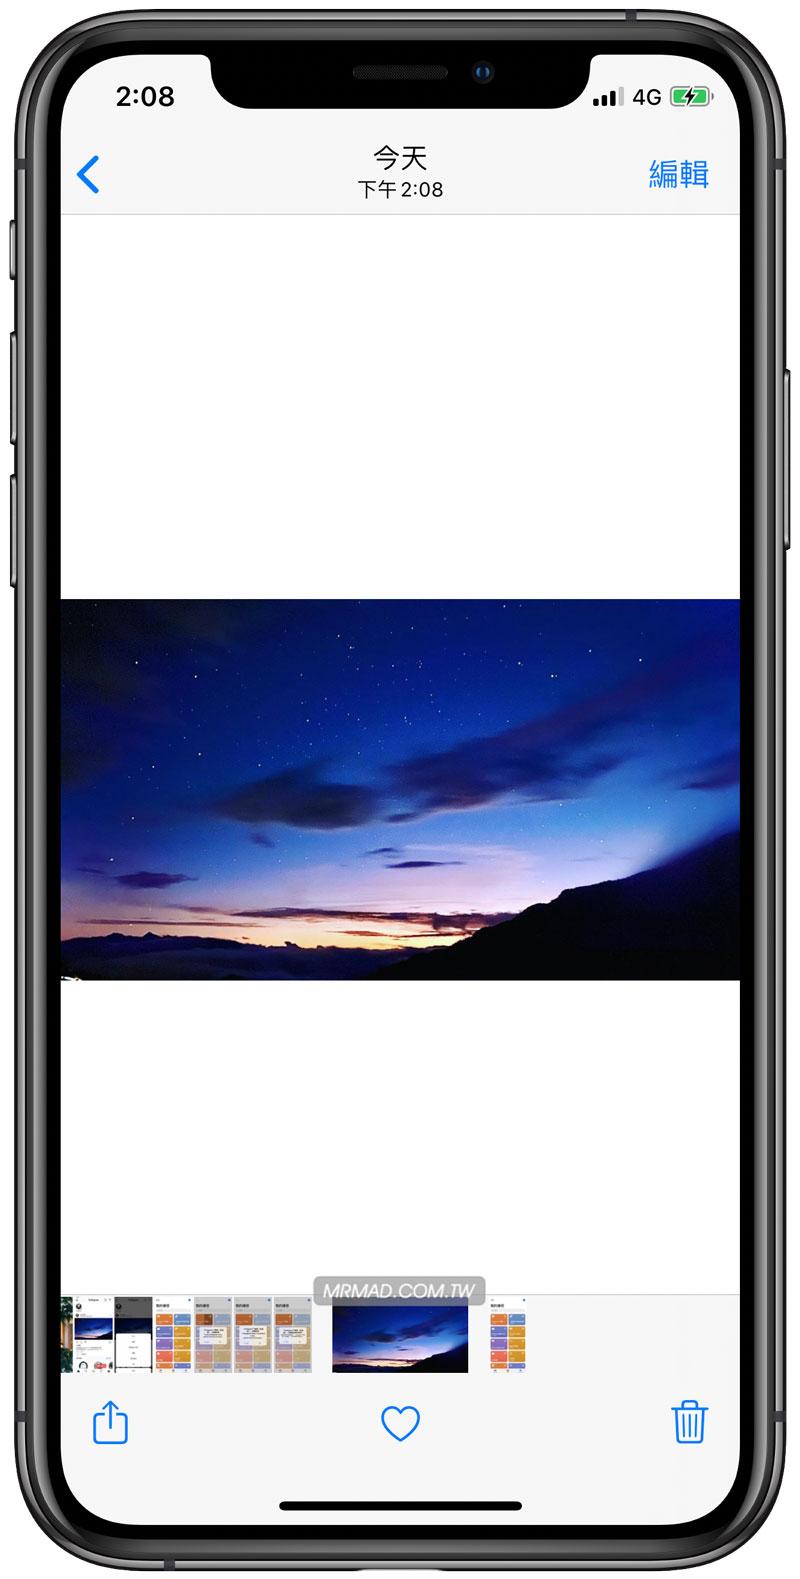 iPhone輕鬆下載Instagram圖片與影片工具《iOS 13 IG捷徑腳本》